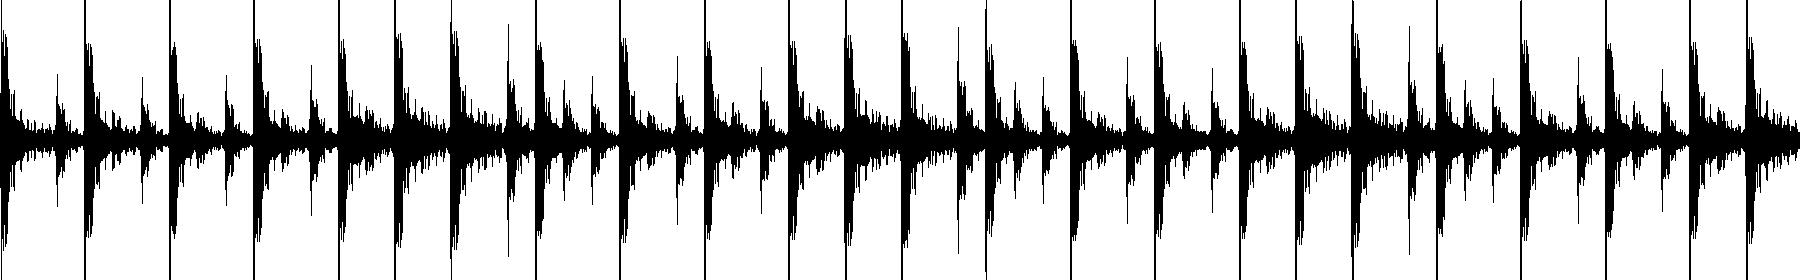 tr08 ch 123 ontherun f minor